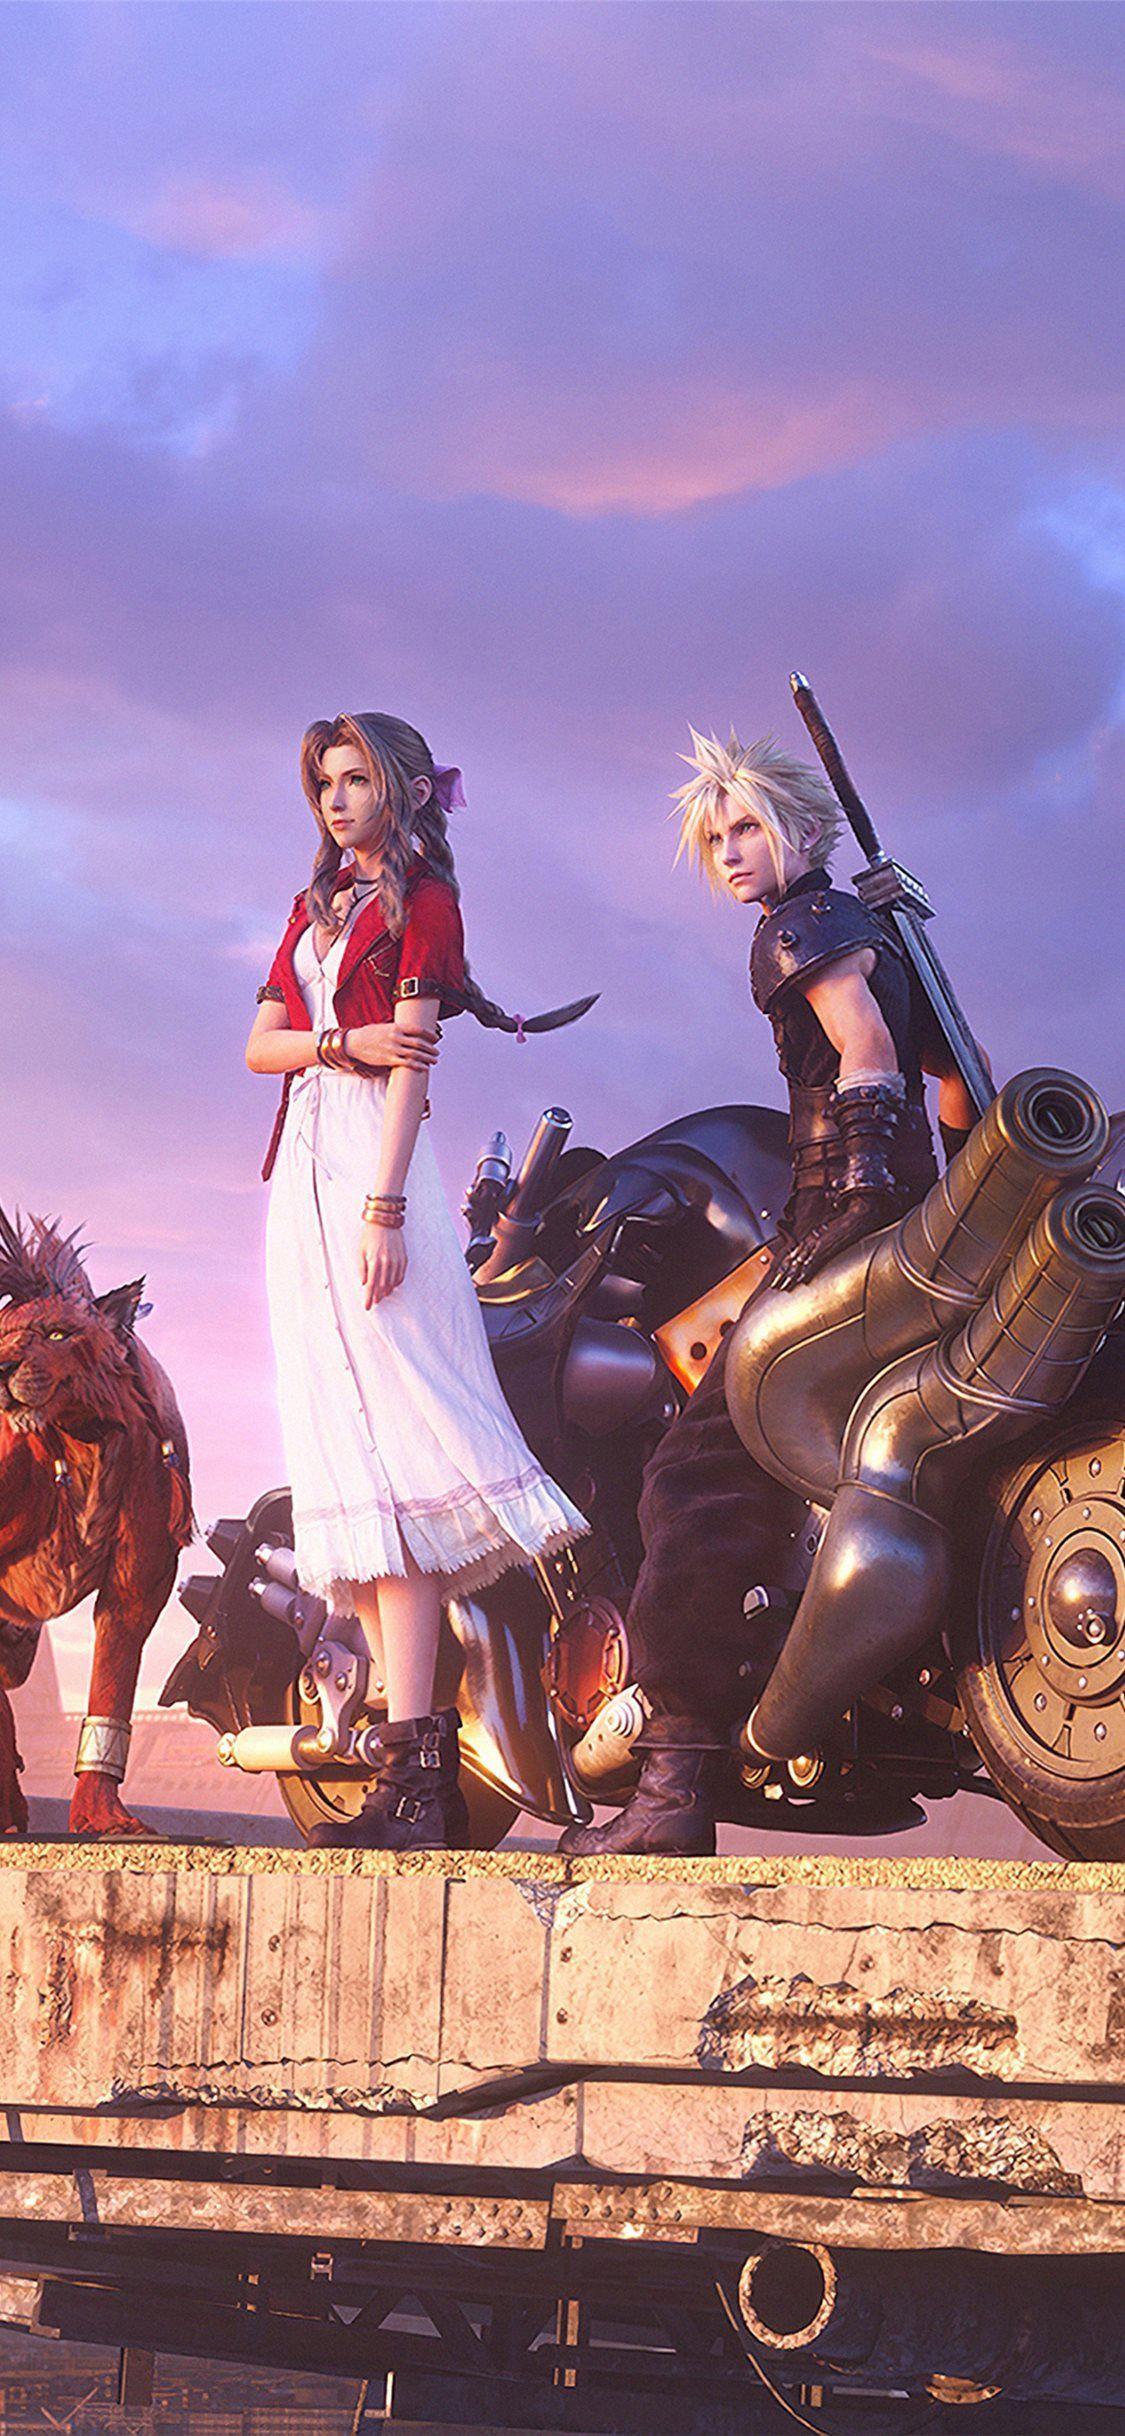 Final Fantasy 7 Remake 4k iPhone Wallpapers - Wallpaper Cave